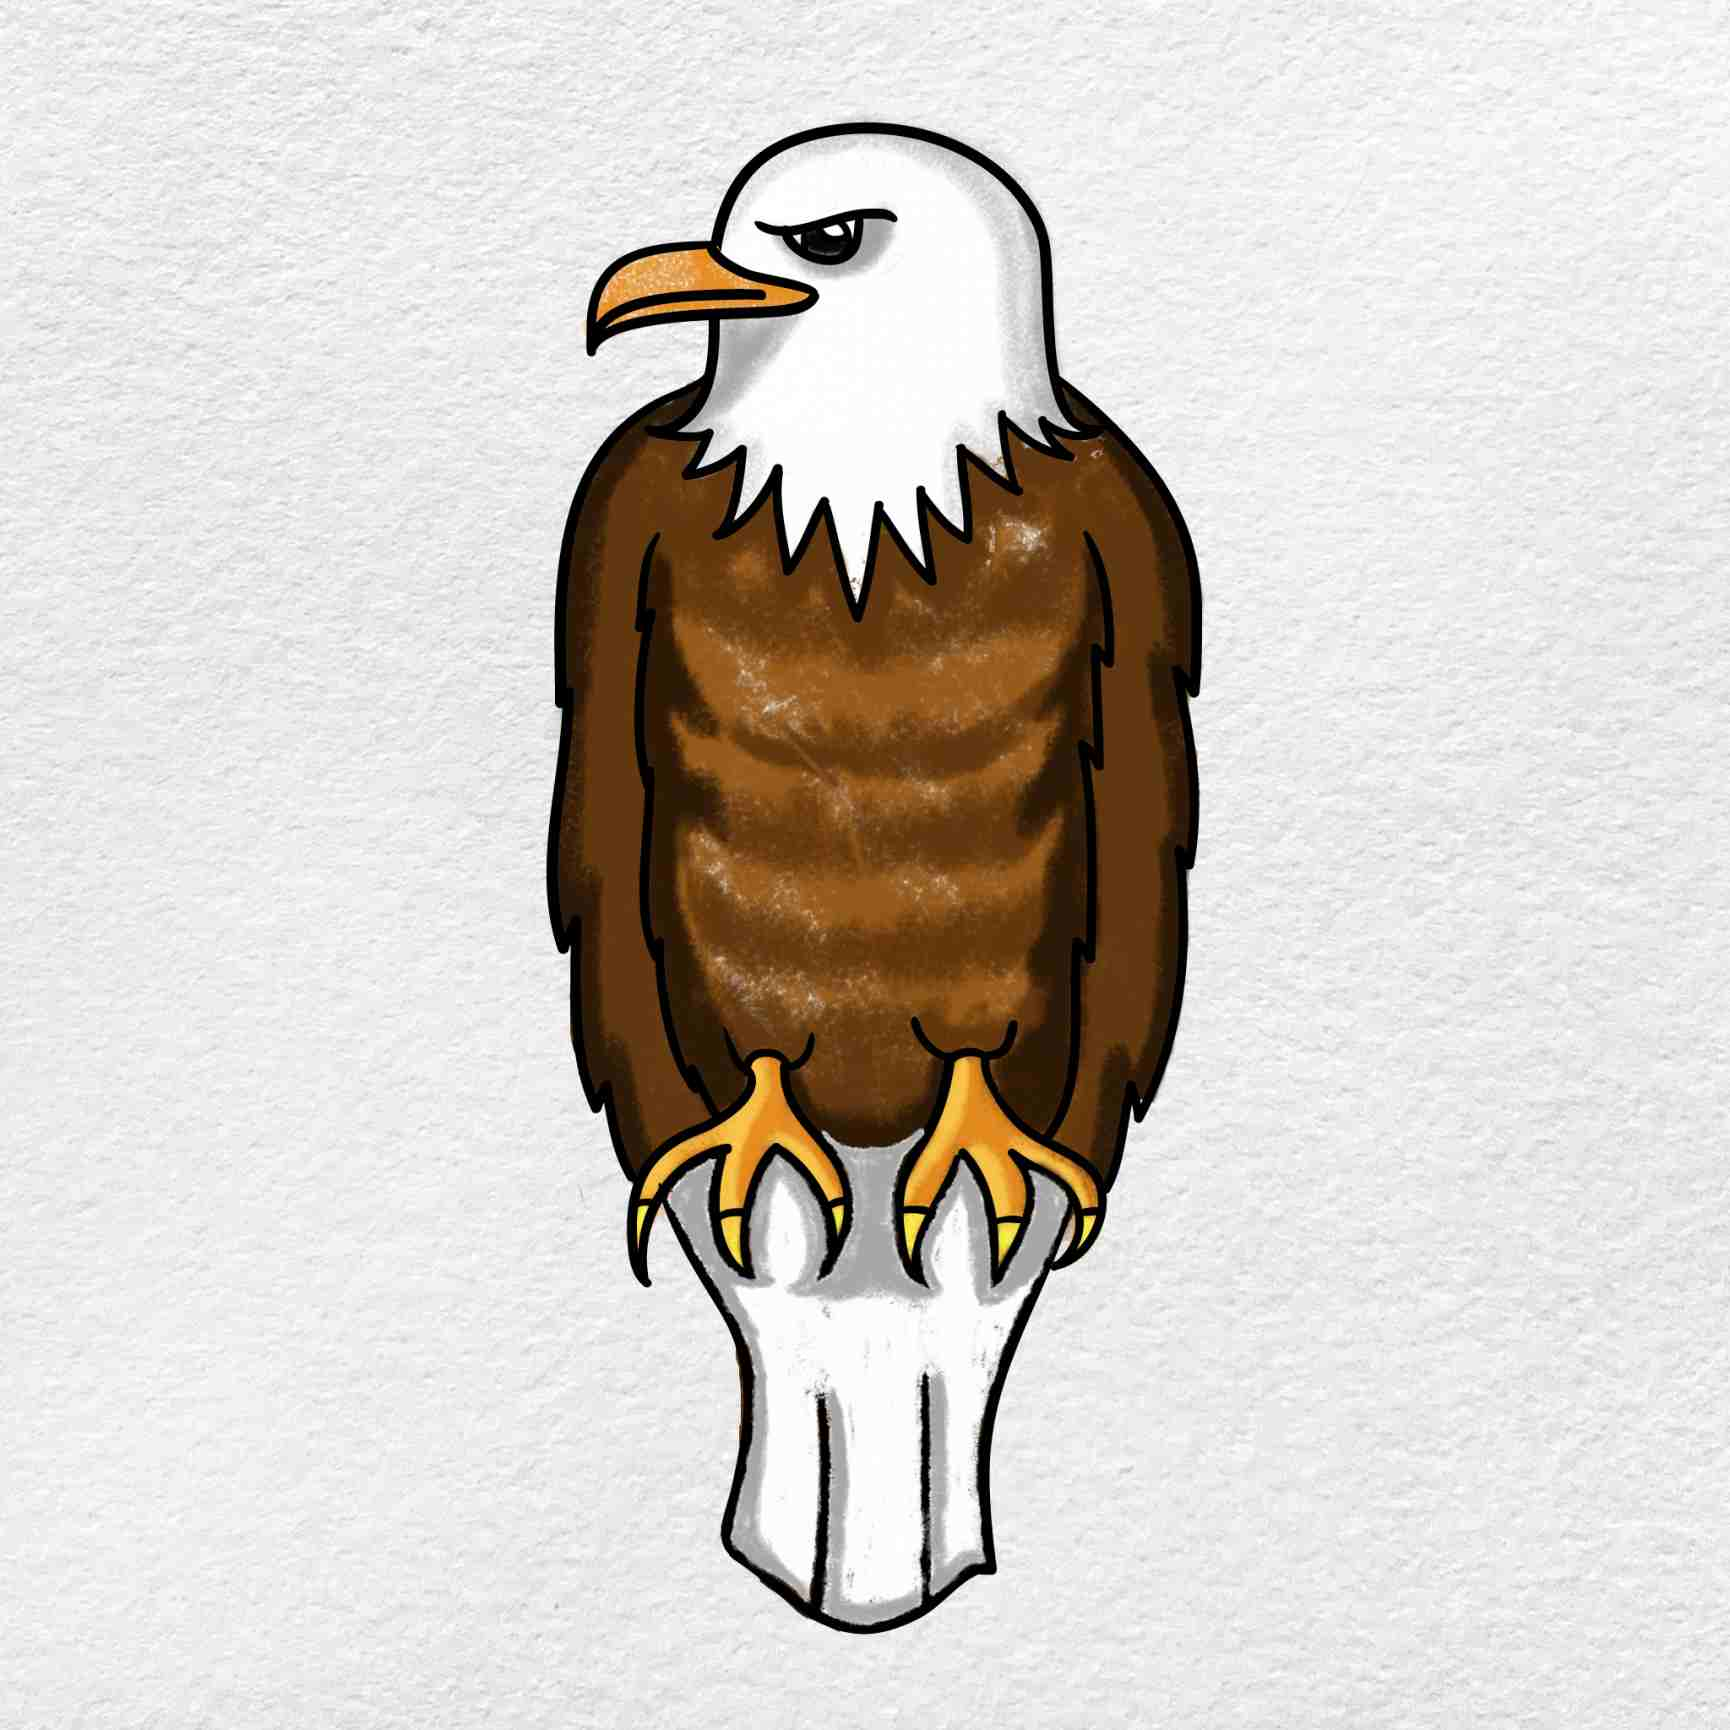 Bald Eagle Drawing: Step 6